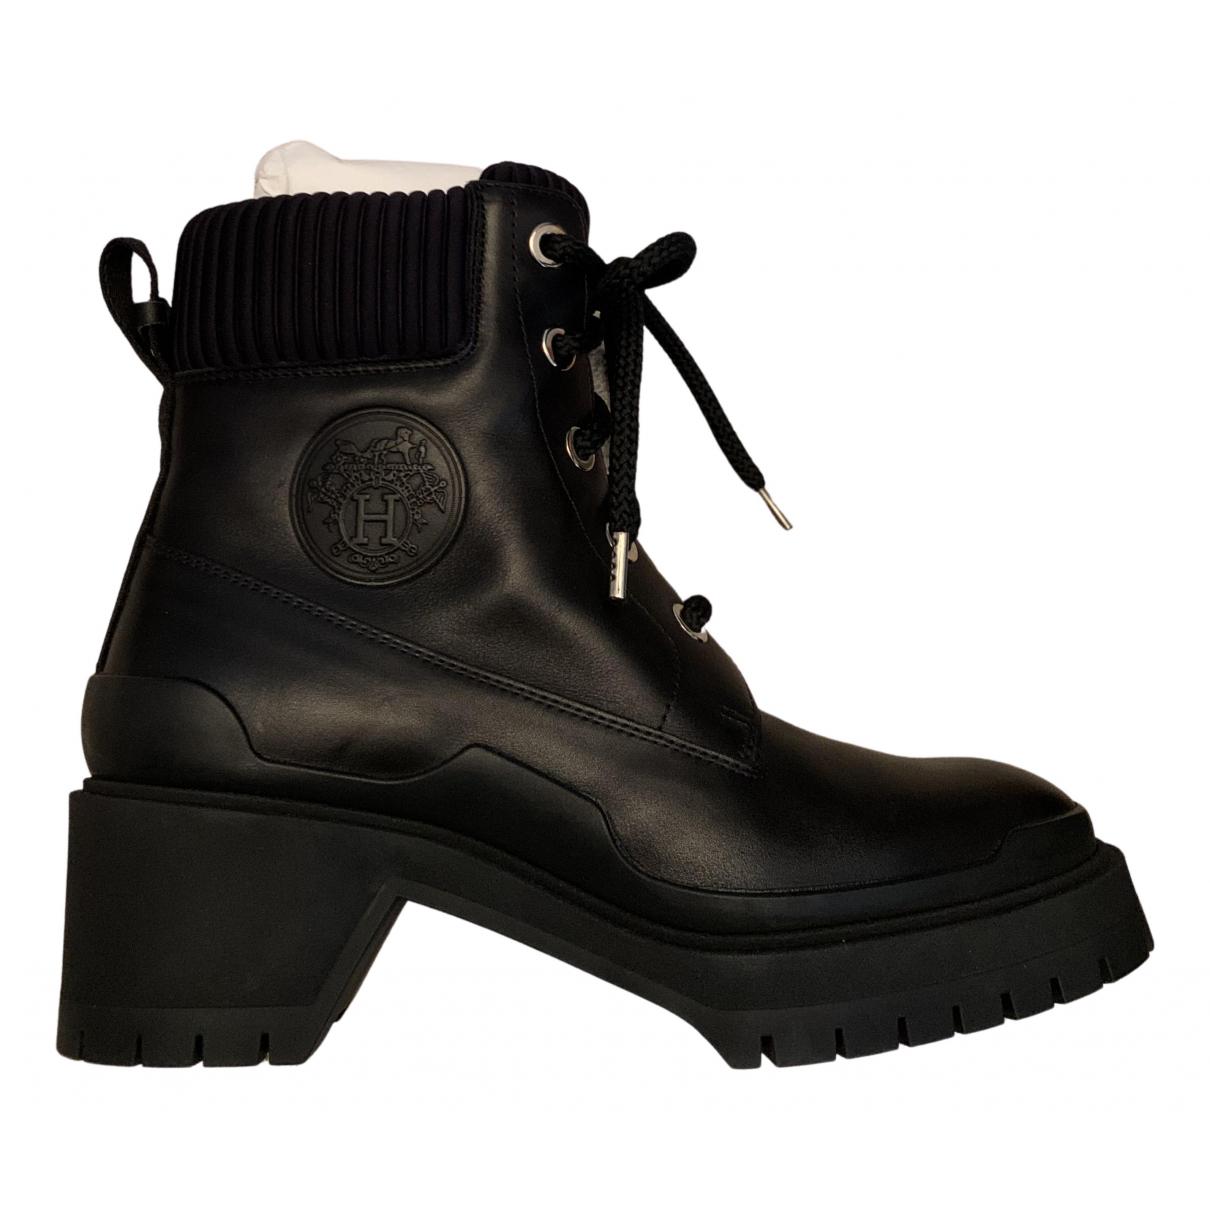 Hermes \N Stiefeletten in  Schwarz Leder